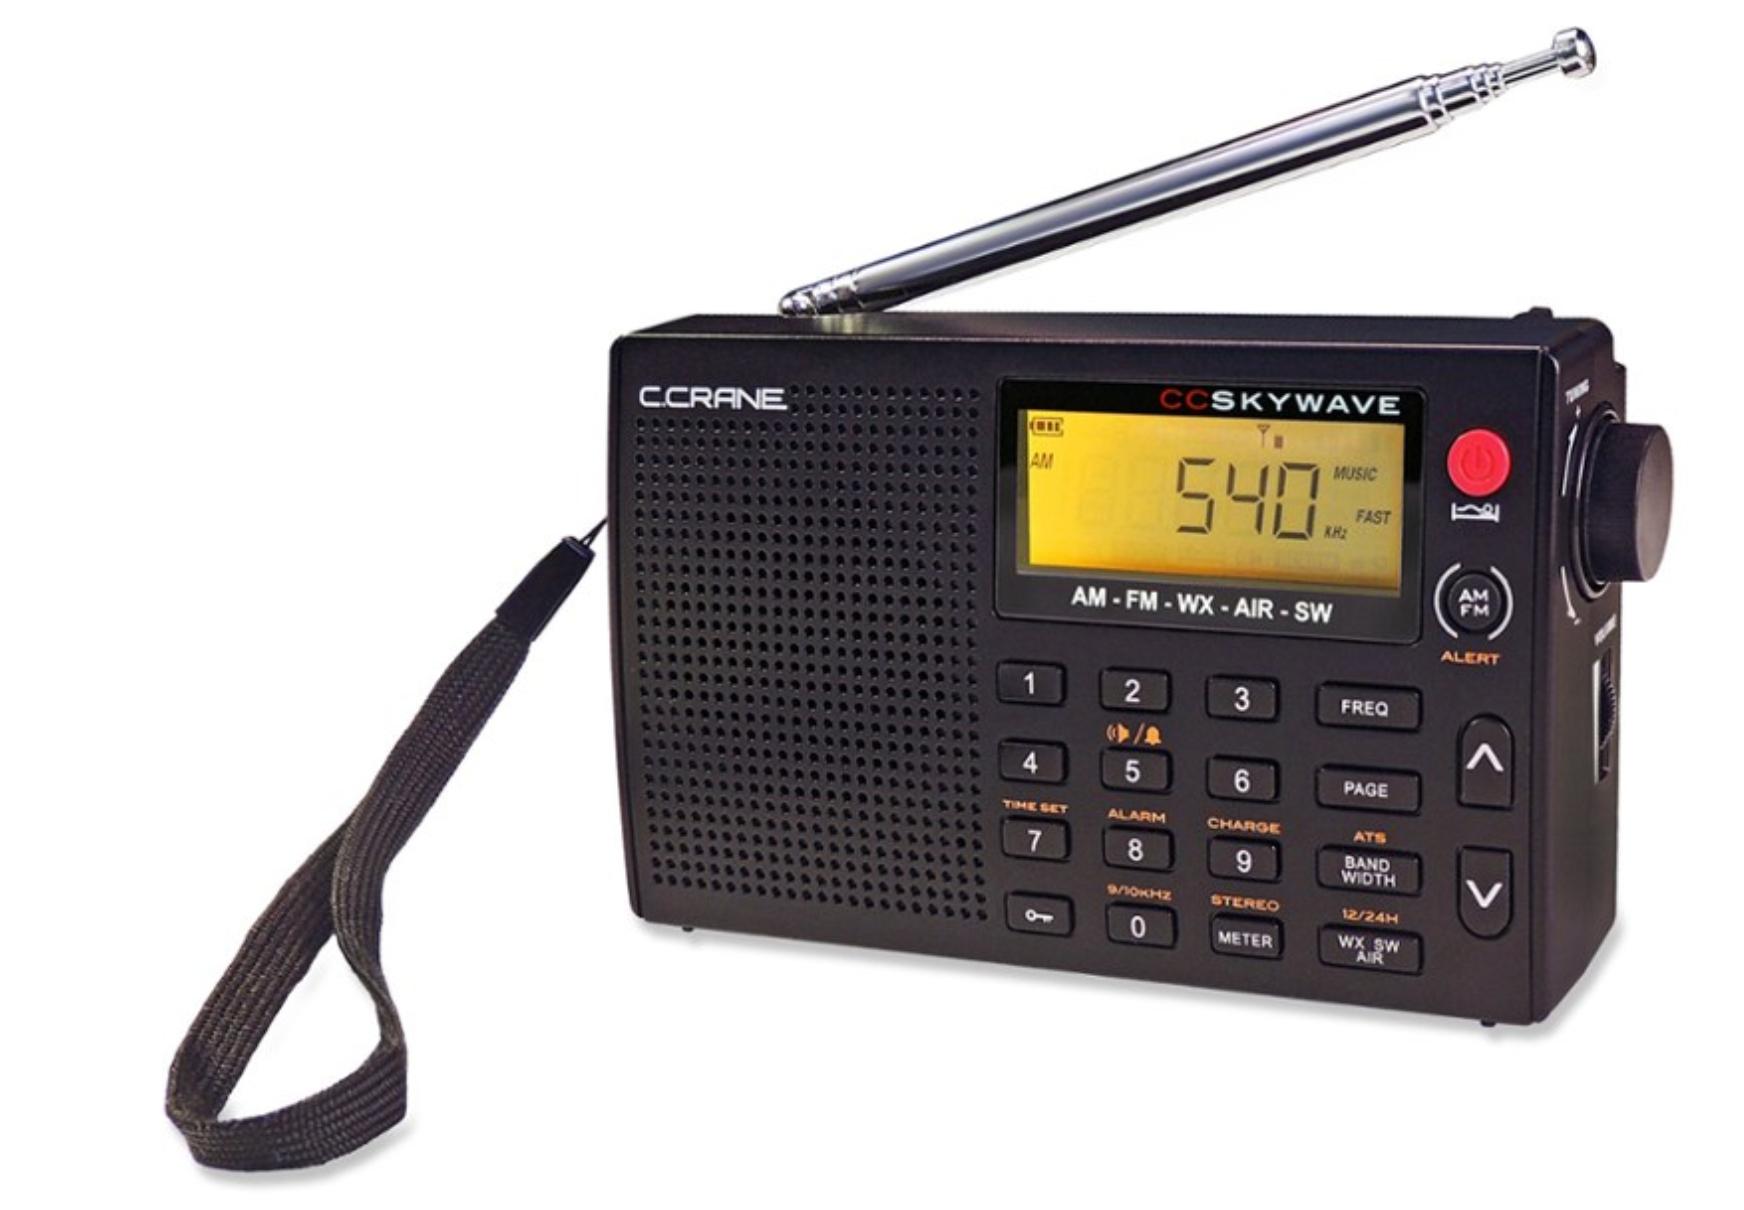 C Crane Skywave Pocket Radio